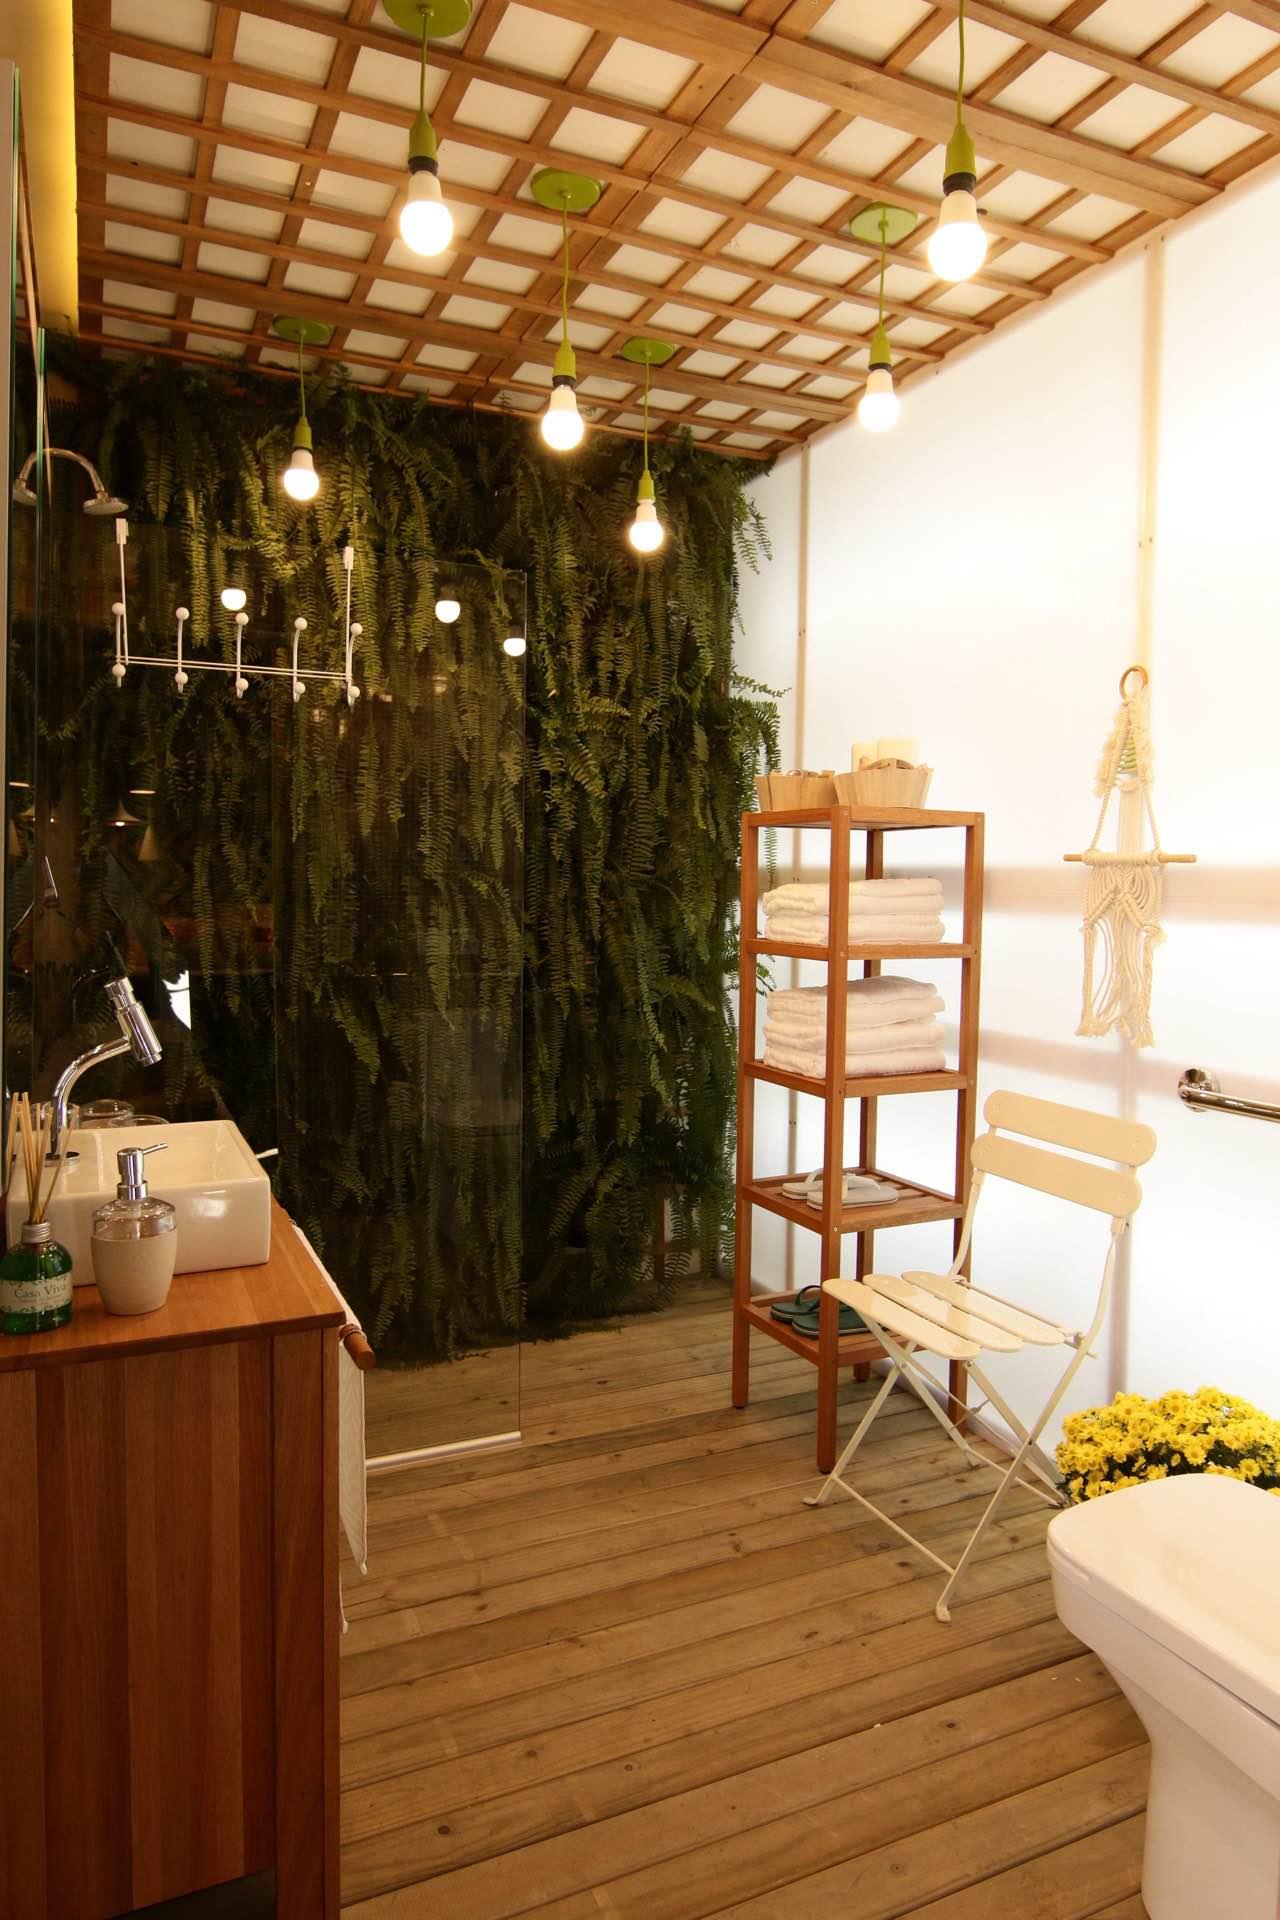 Casa Viva Leroy Merlin: lavabo inspirado em São Paulo